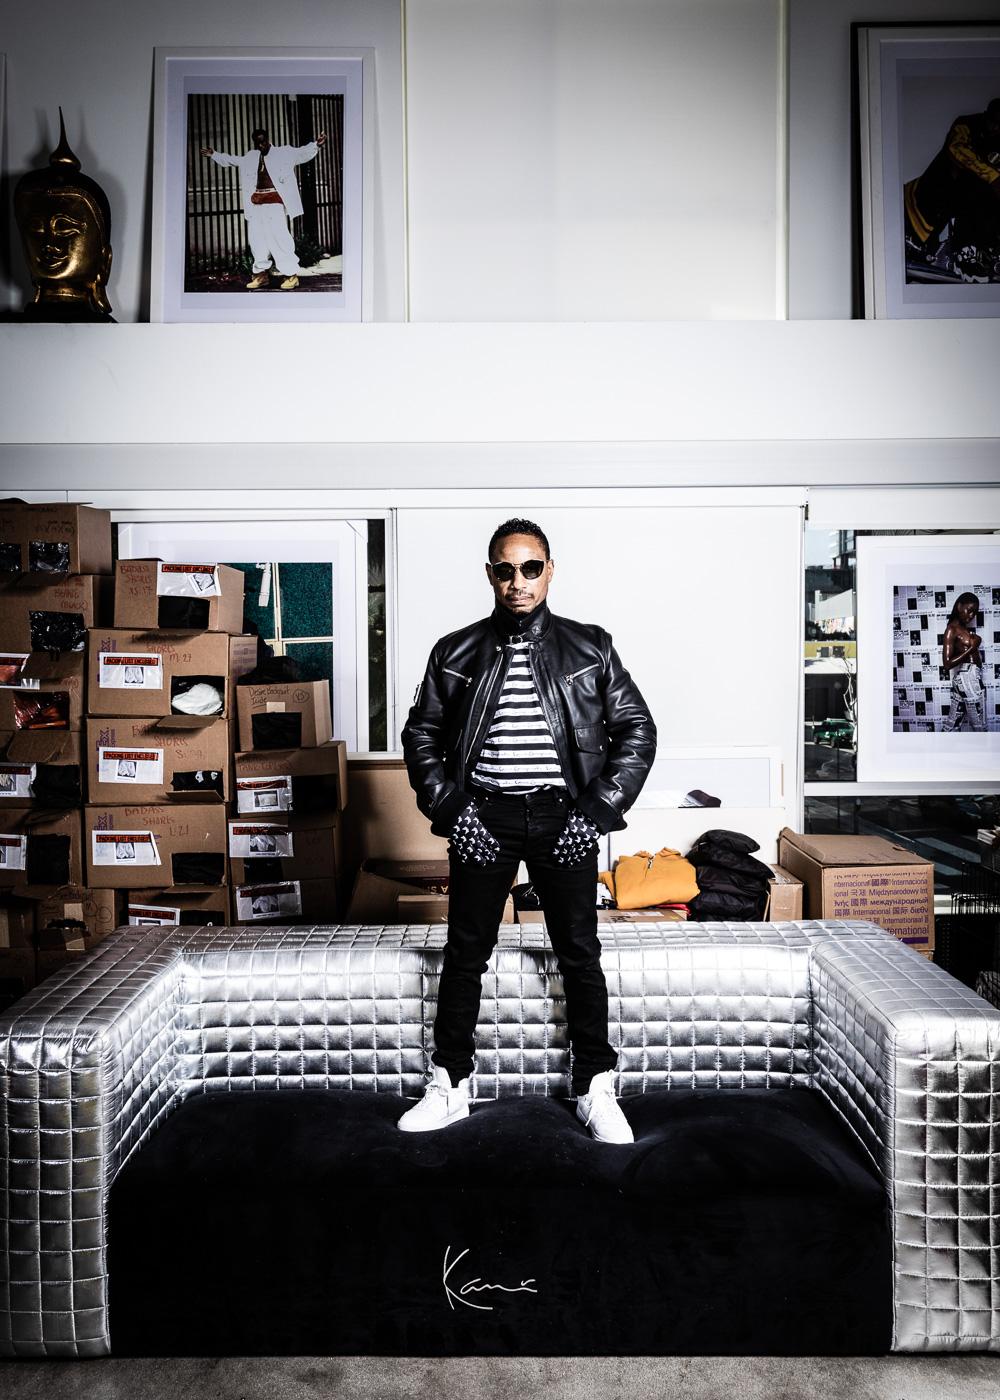 Karl Kani, American fashion designer, founder and CEO of the hip hop fashion brand Karl Kani